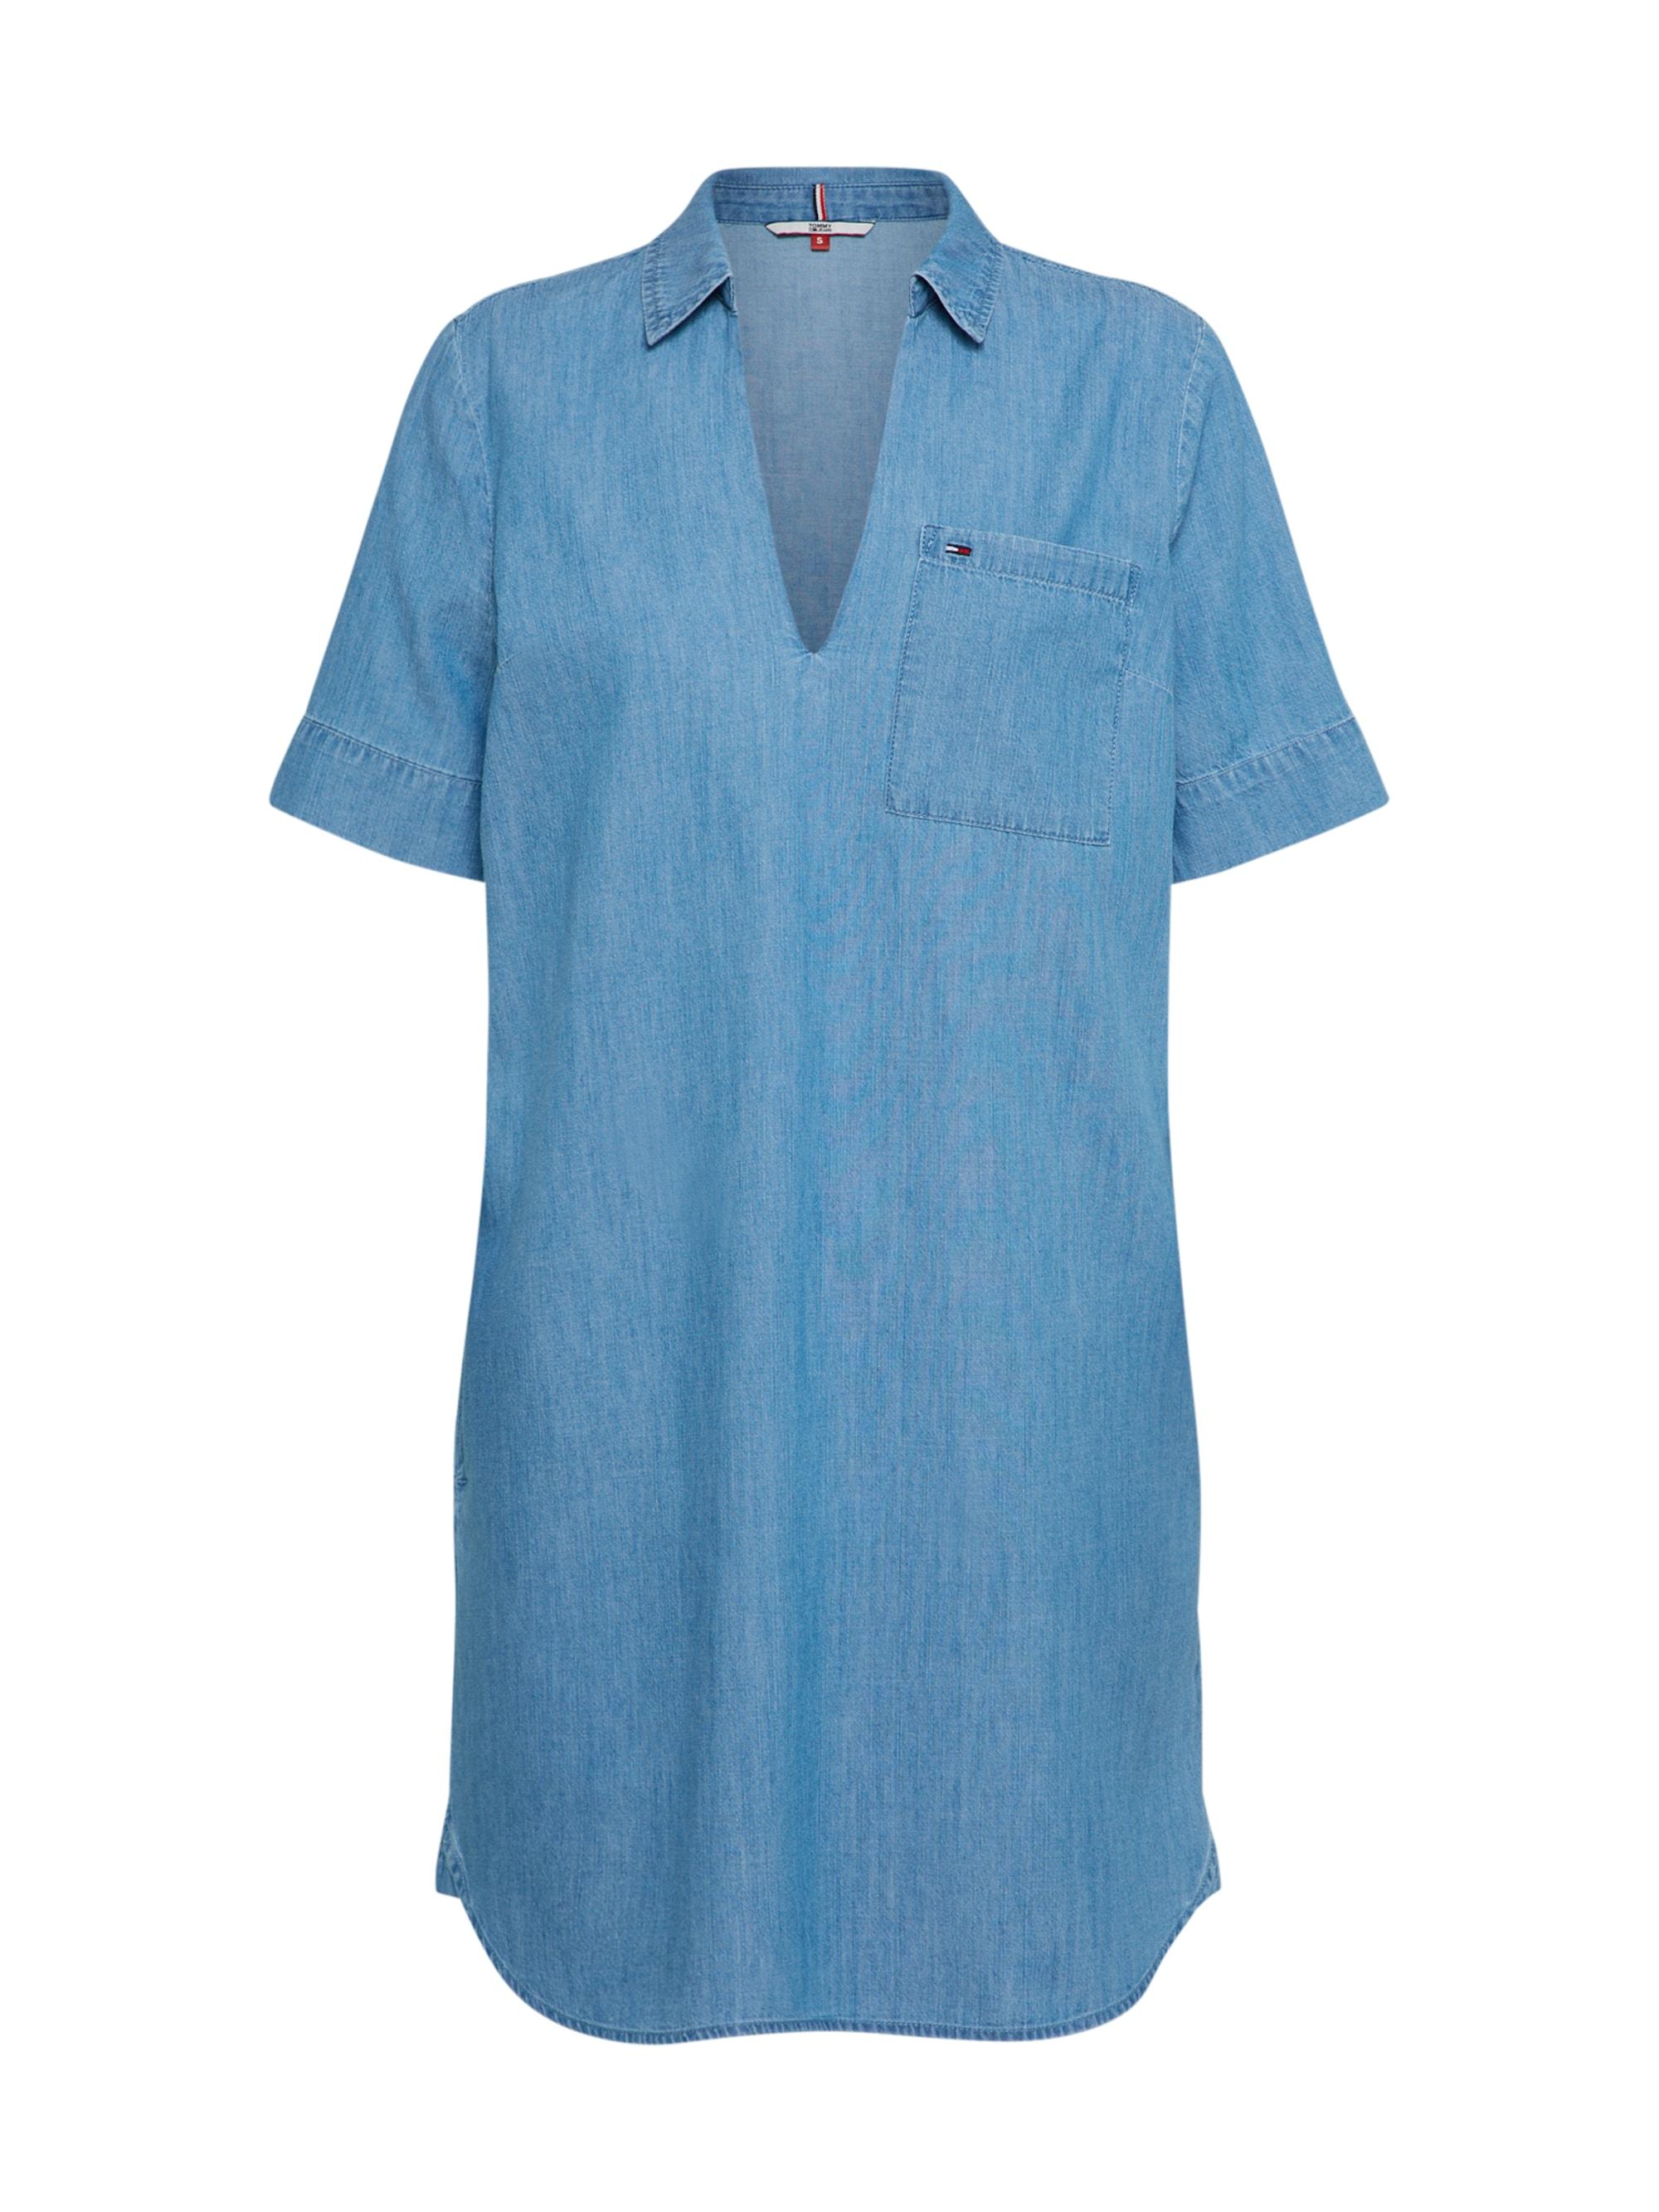 Kleid ´INDIGO SHIRT DRESS´